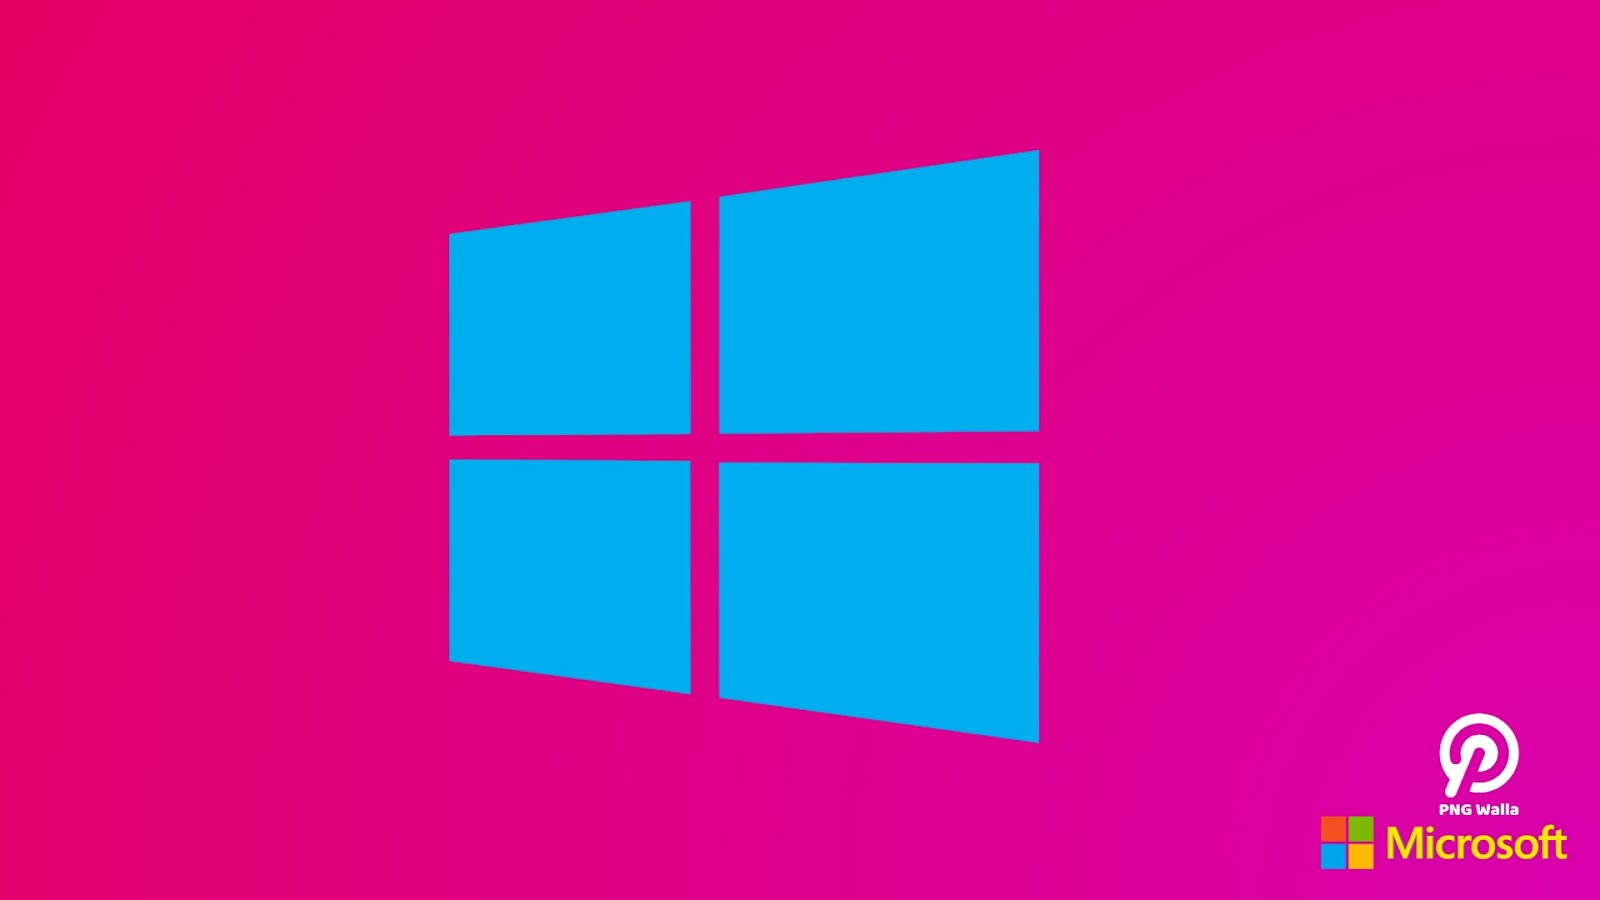 Top 10 Simple Windows Wallpaper Hd 920x1080 4k Desktop Background Wallpaper Png Walla